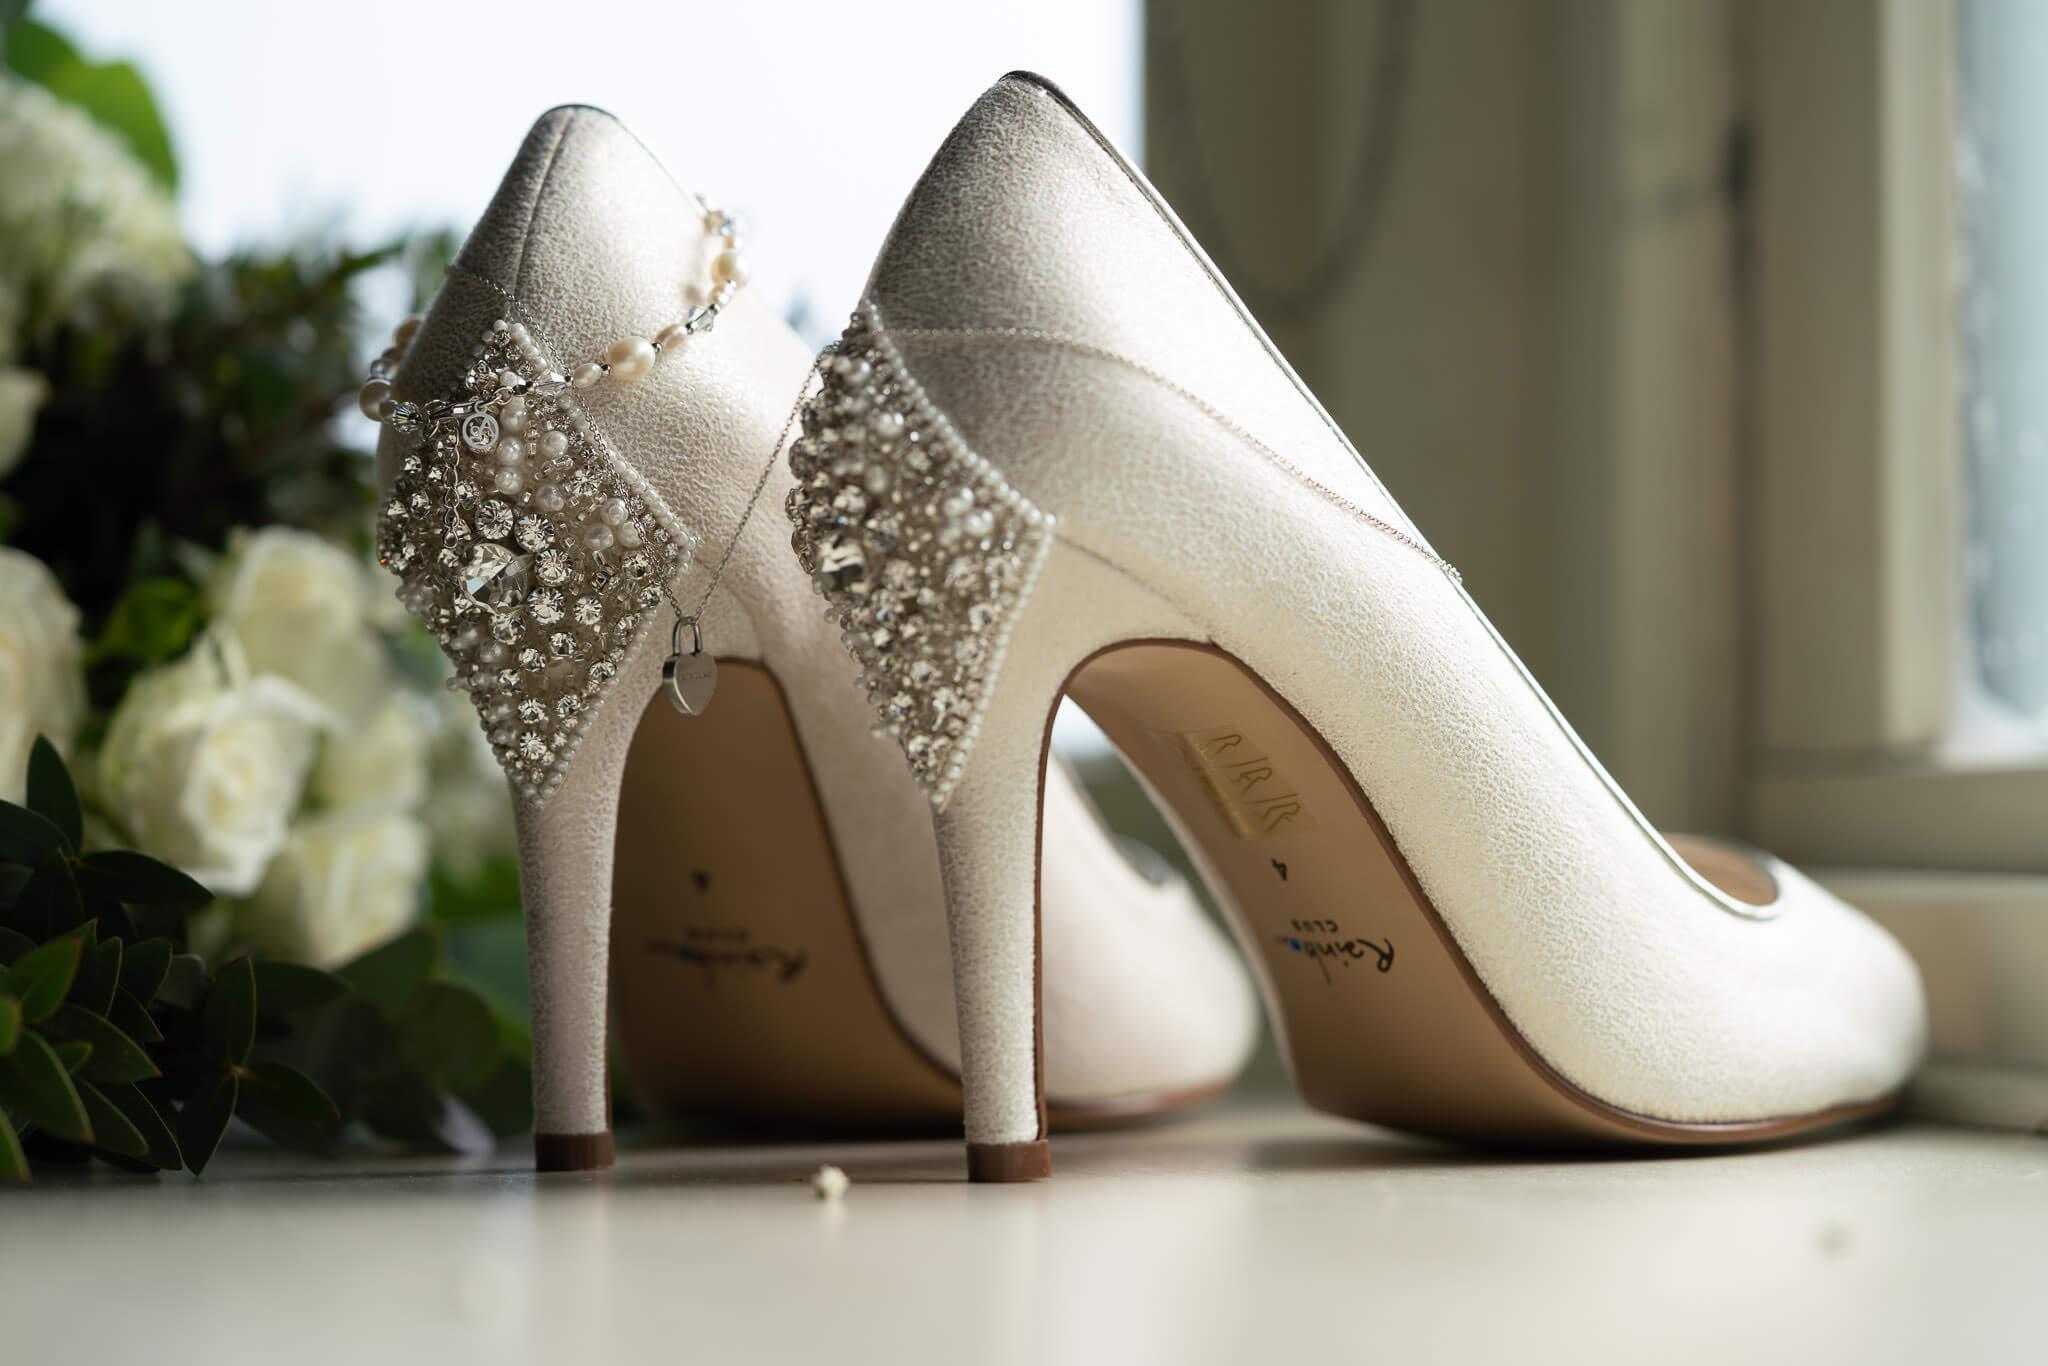 bristol-and-somerset-wedding-photographer-34.jpg